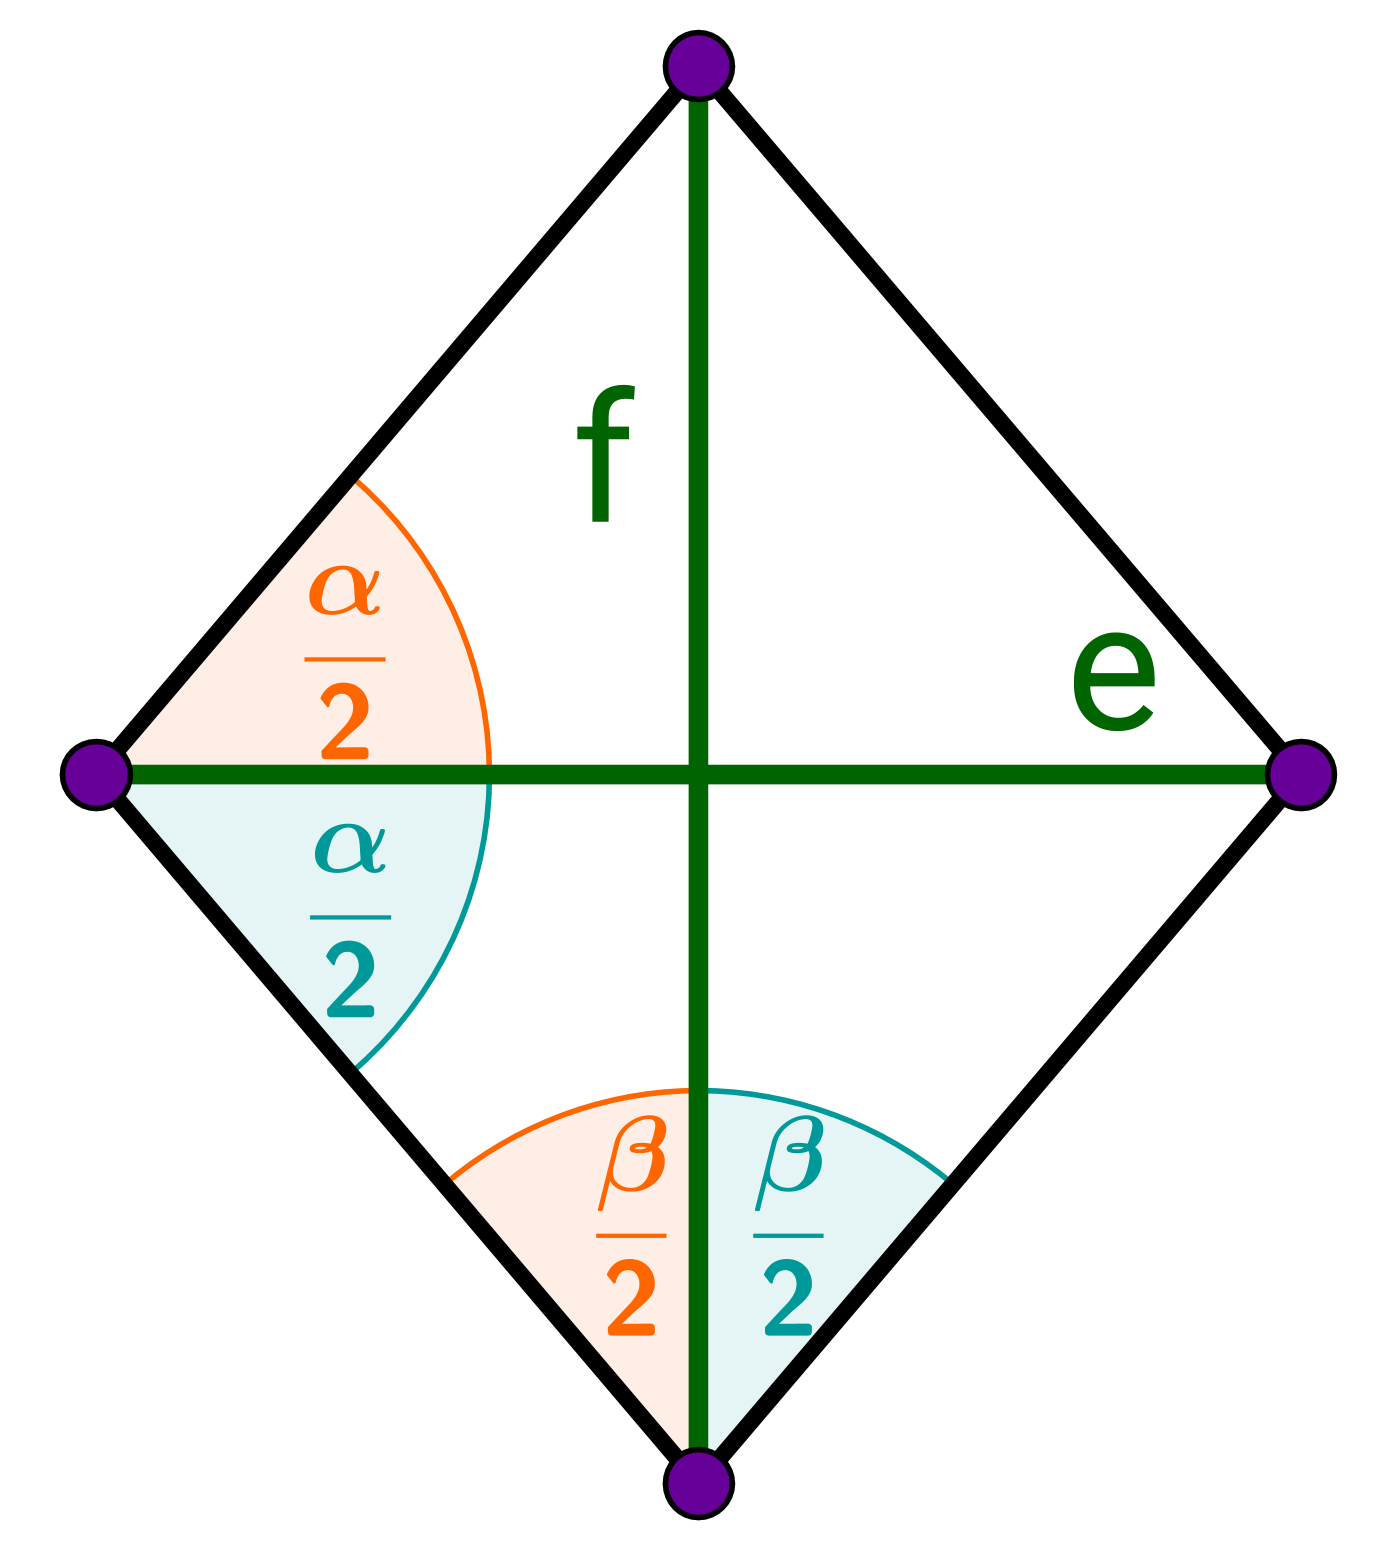 Raute, Winkel, Diagonale